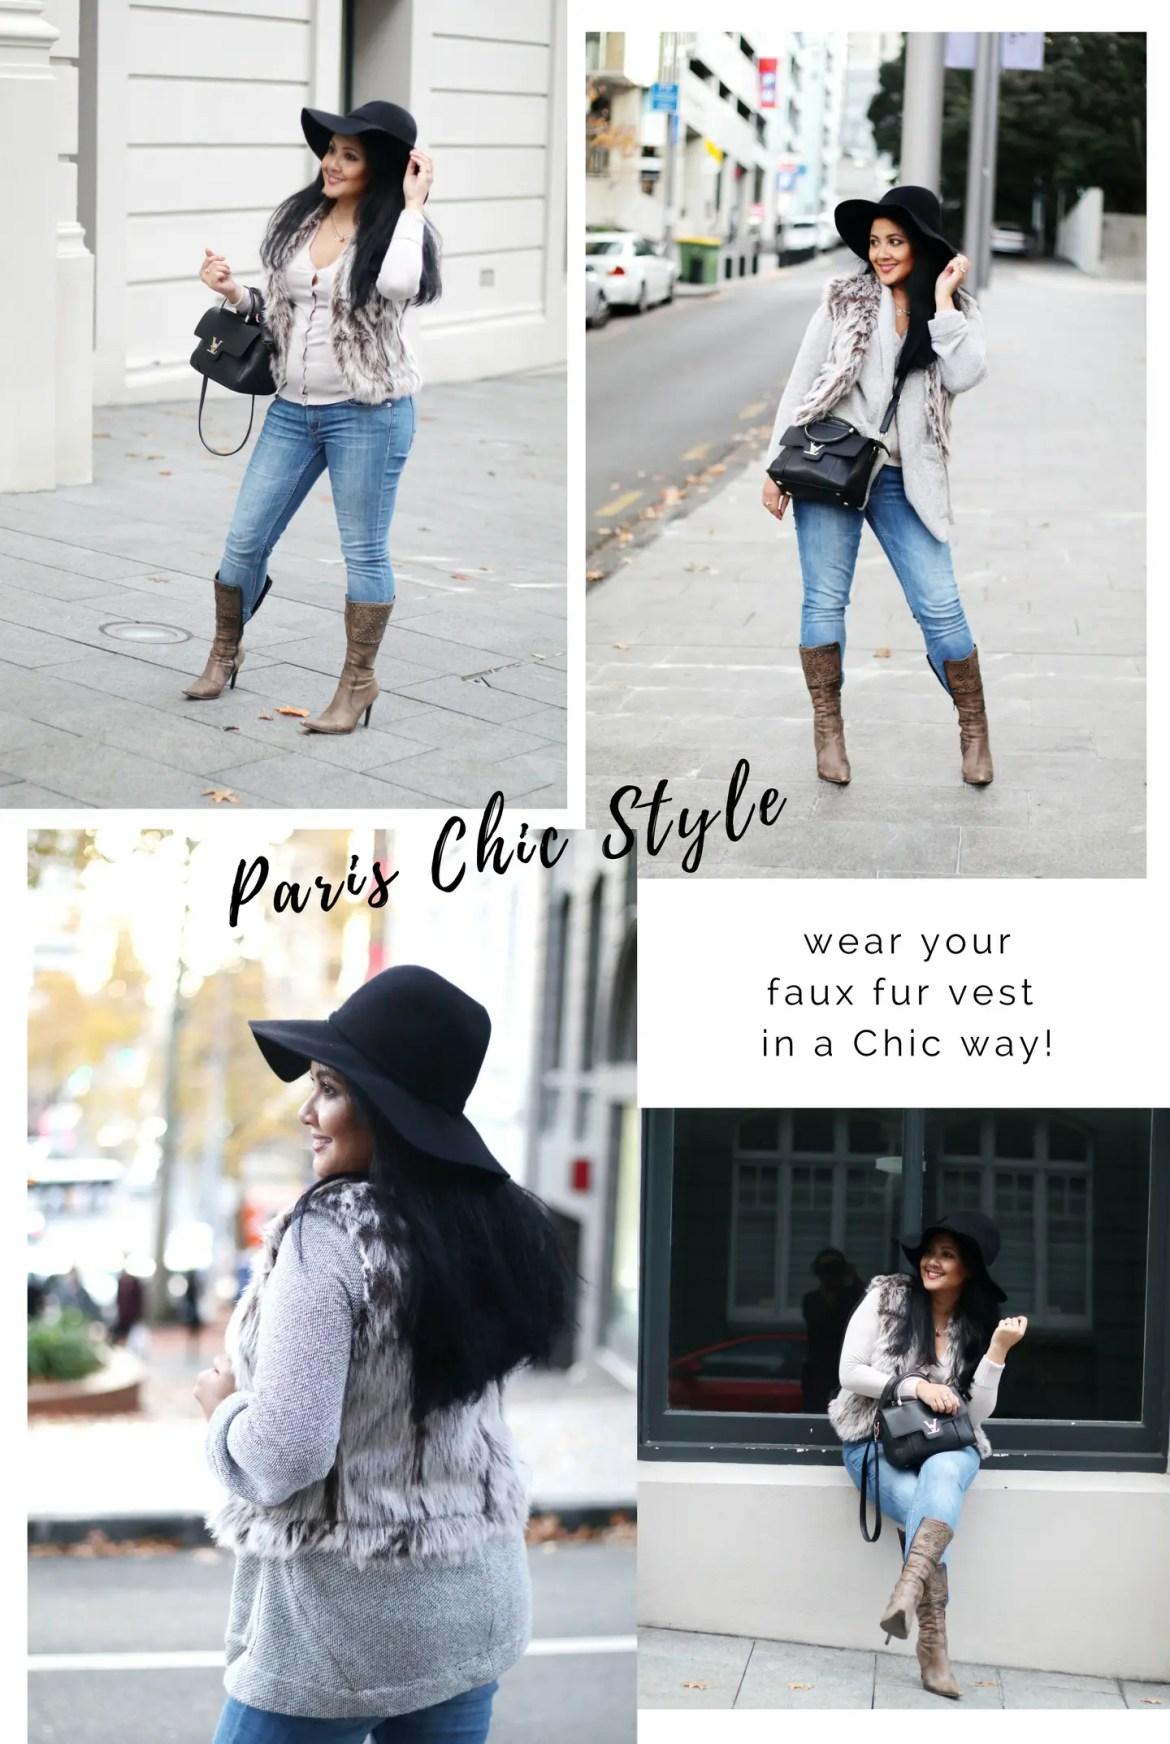 Paris Chic Style How To Wear A Faux Fur Vest Parisian Chic Style Everyday Fashion 1 (1)